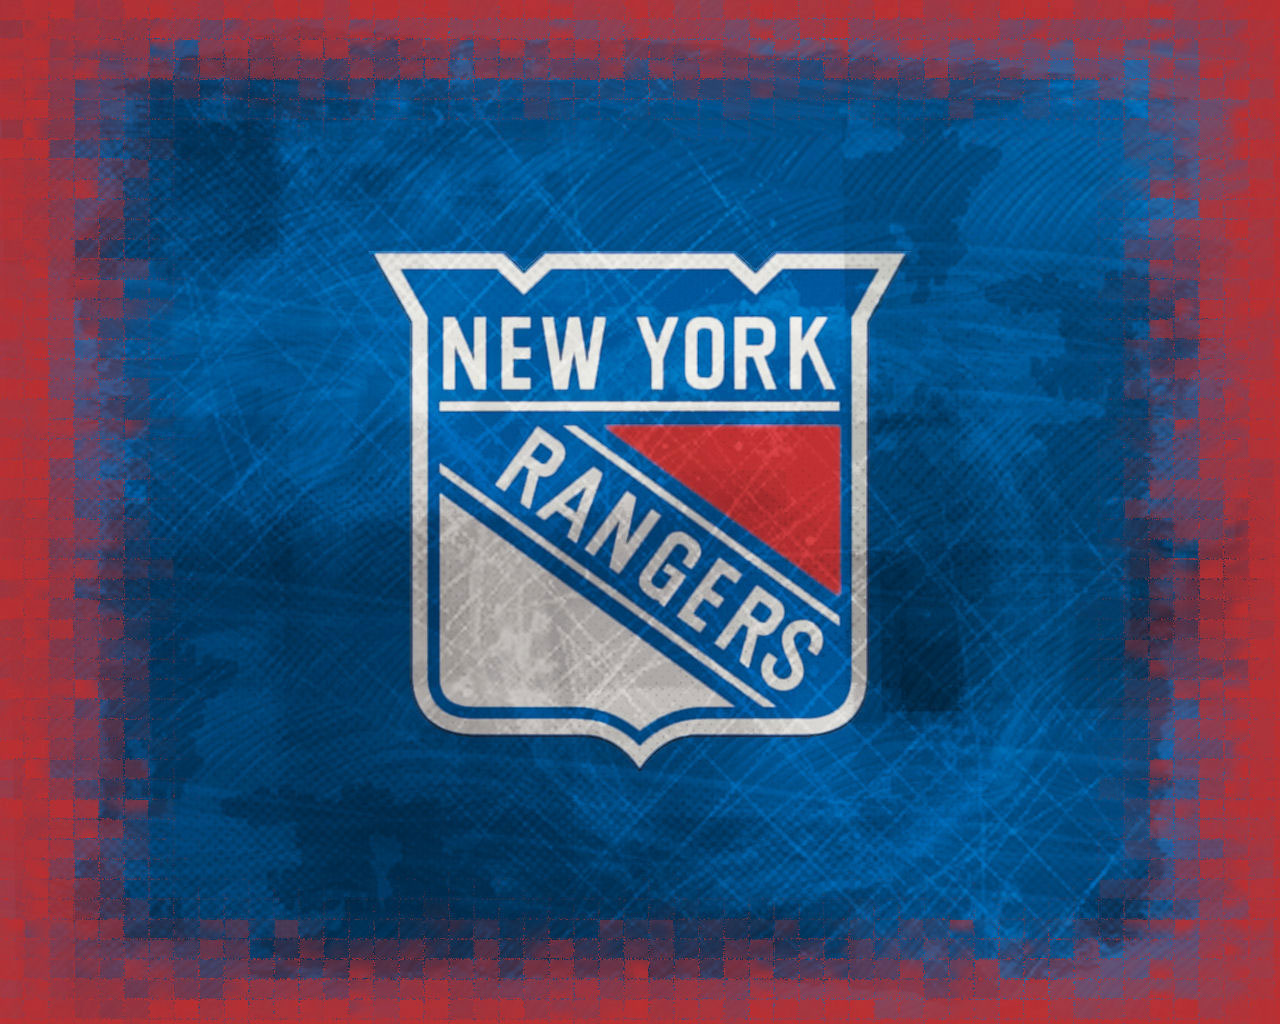 New York Rangers wallpapers New York Rangers background 1280x1024